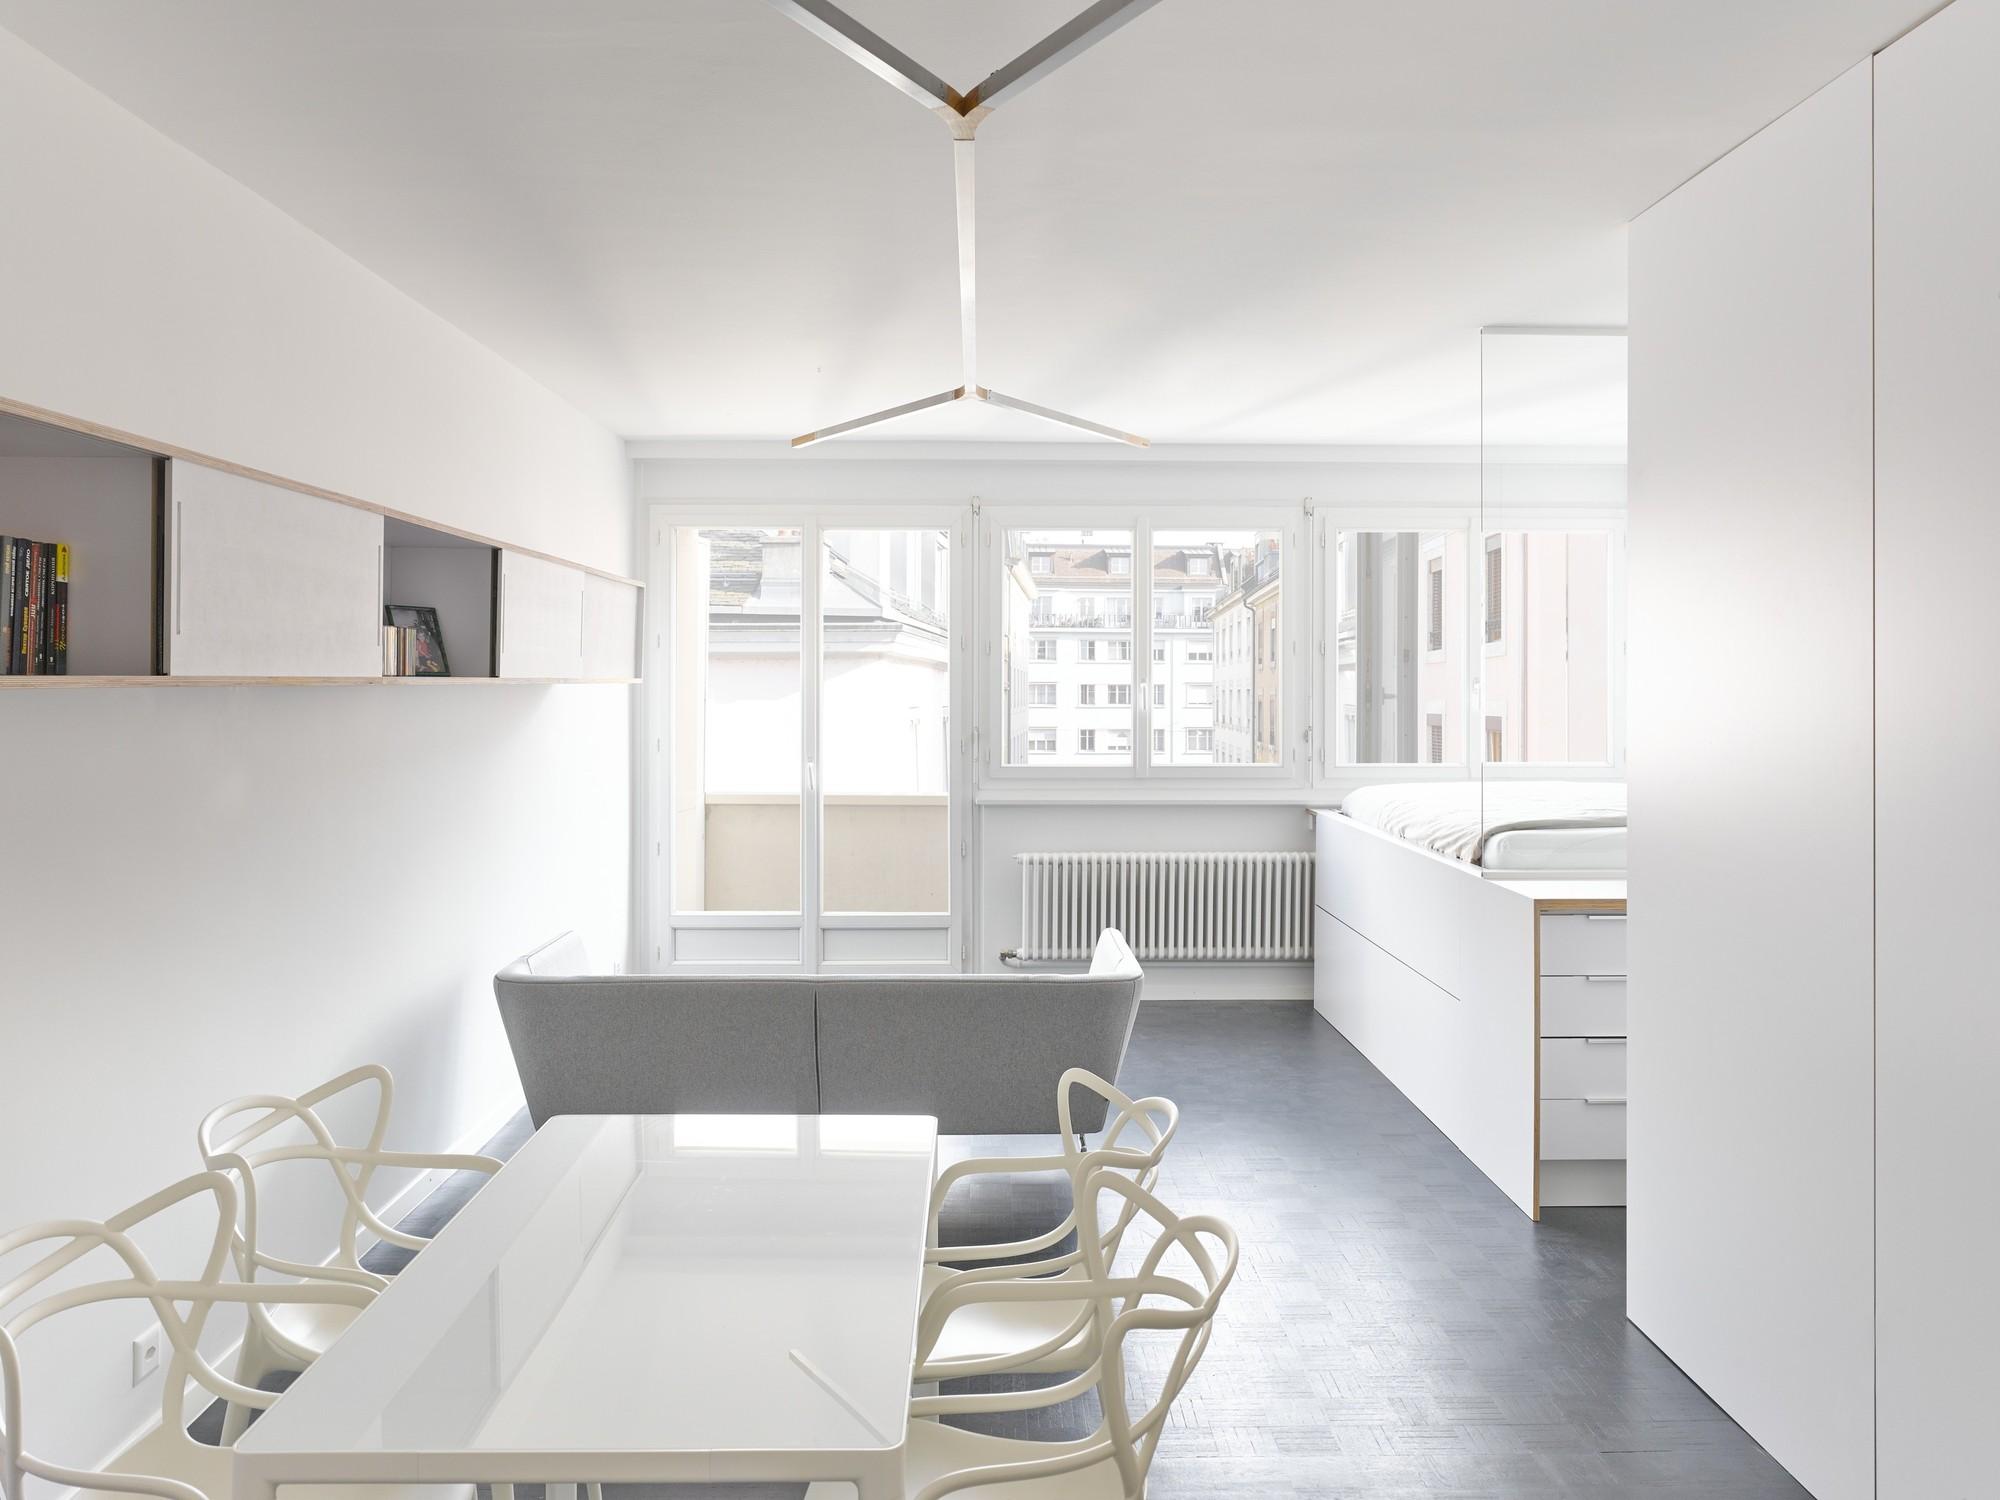 Geneva flat freaks freearchitects archdaily for Casa moderna total white